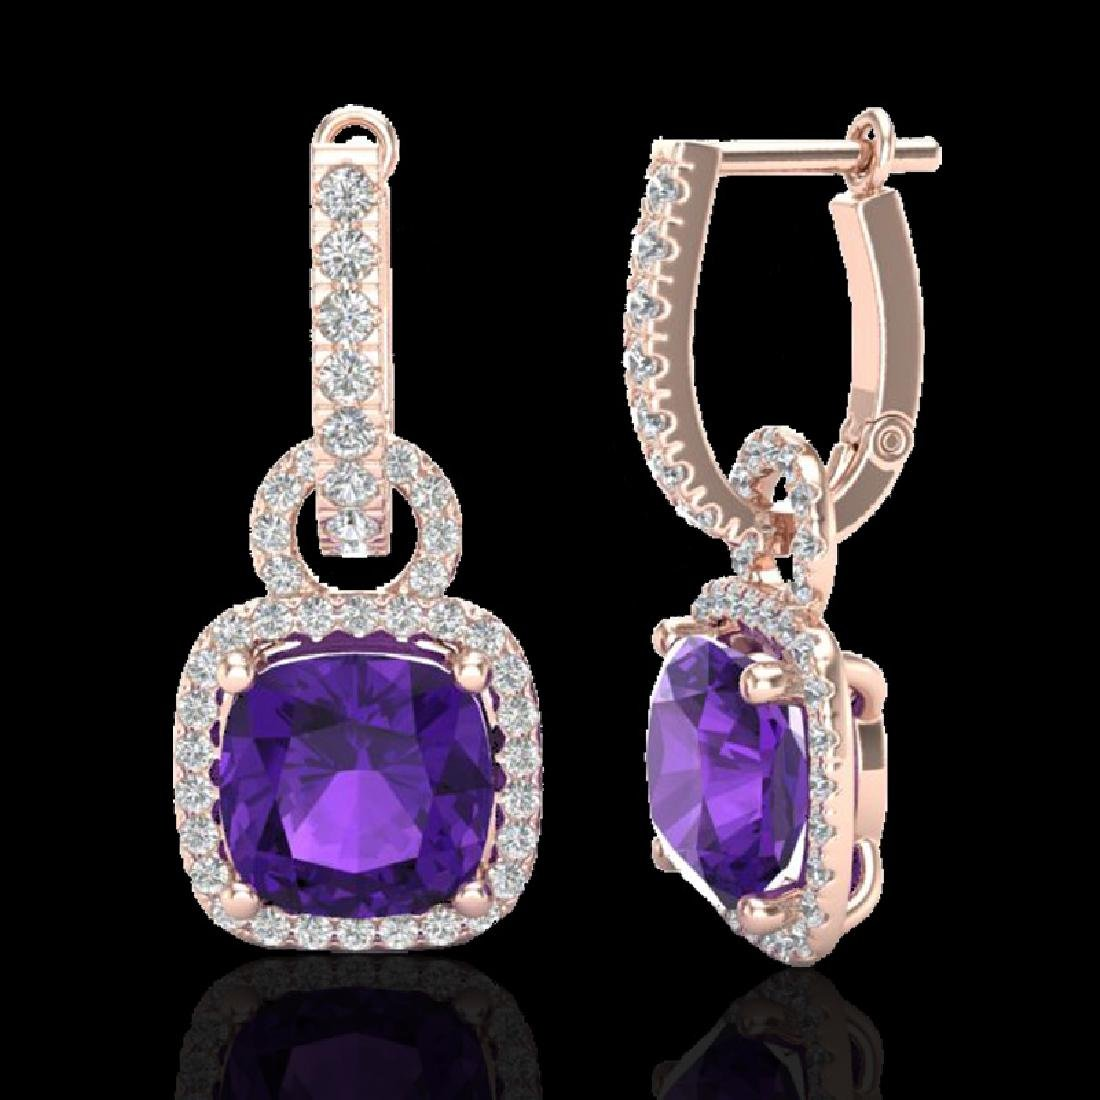 7 CTW Amethyst & Micro Pave VS/SI Diamond Earrings 14K - 2